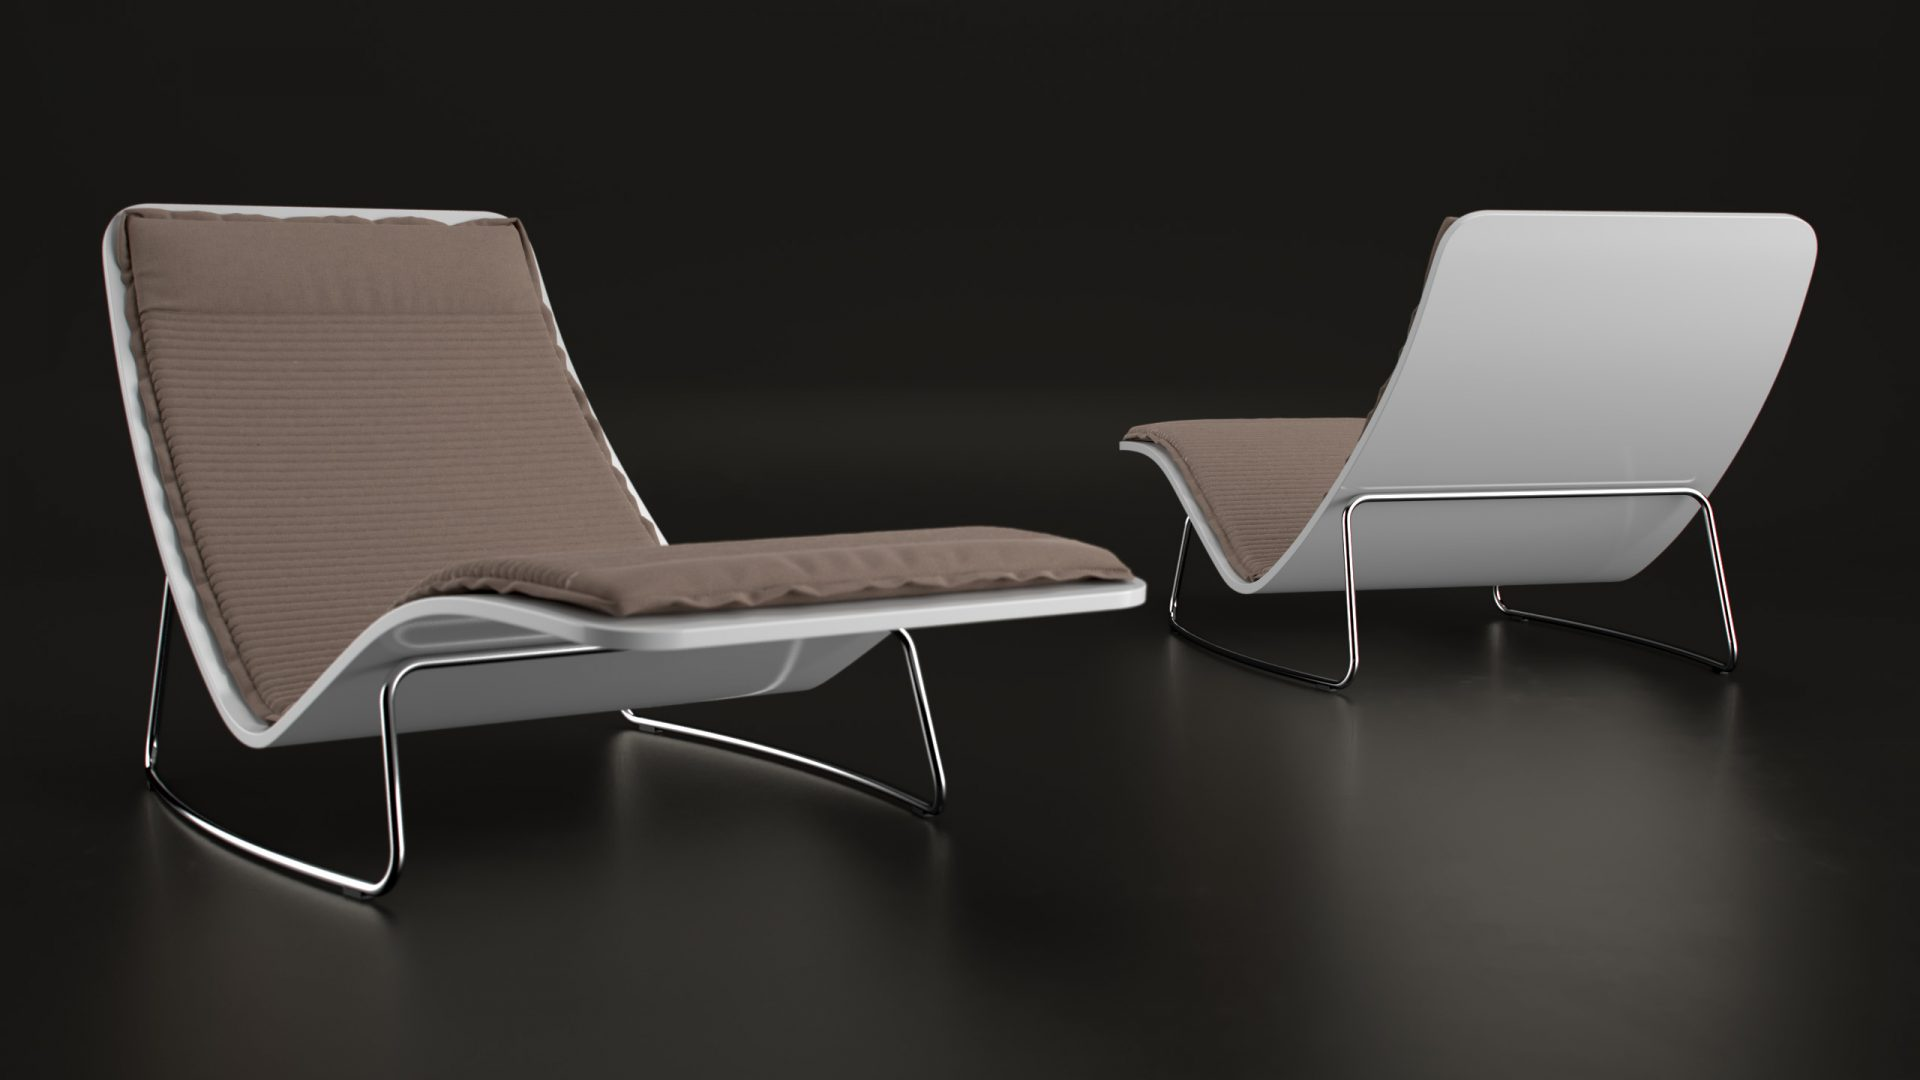 Vintage_ChaiseLounge_Couchs_001_BlackSet_01_V1.01_0006